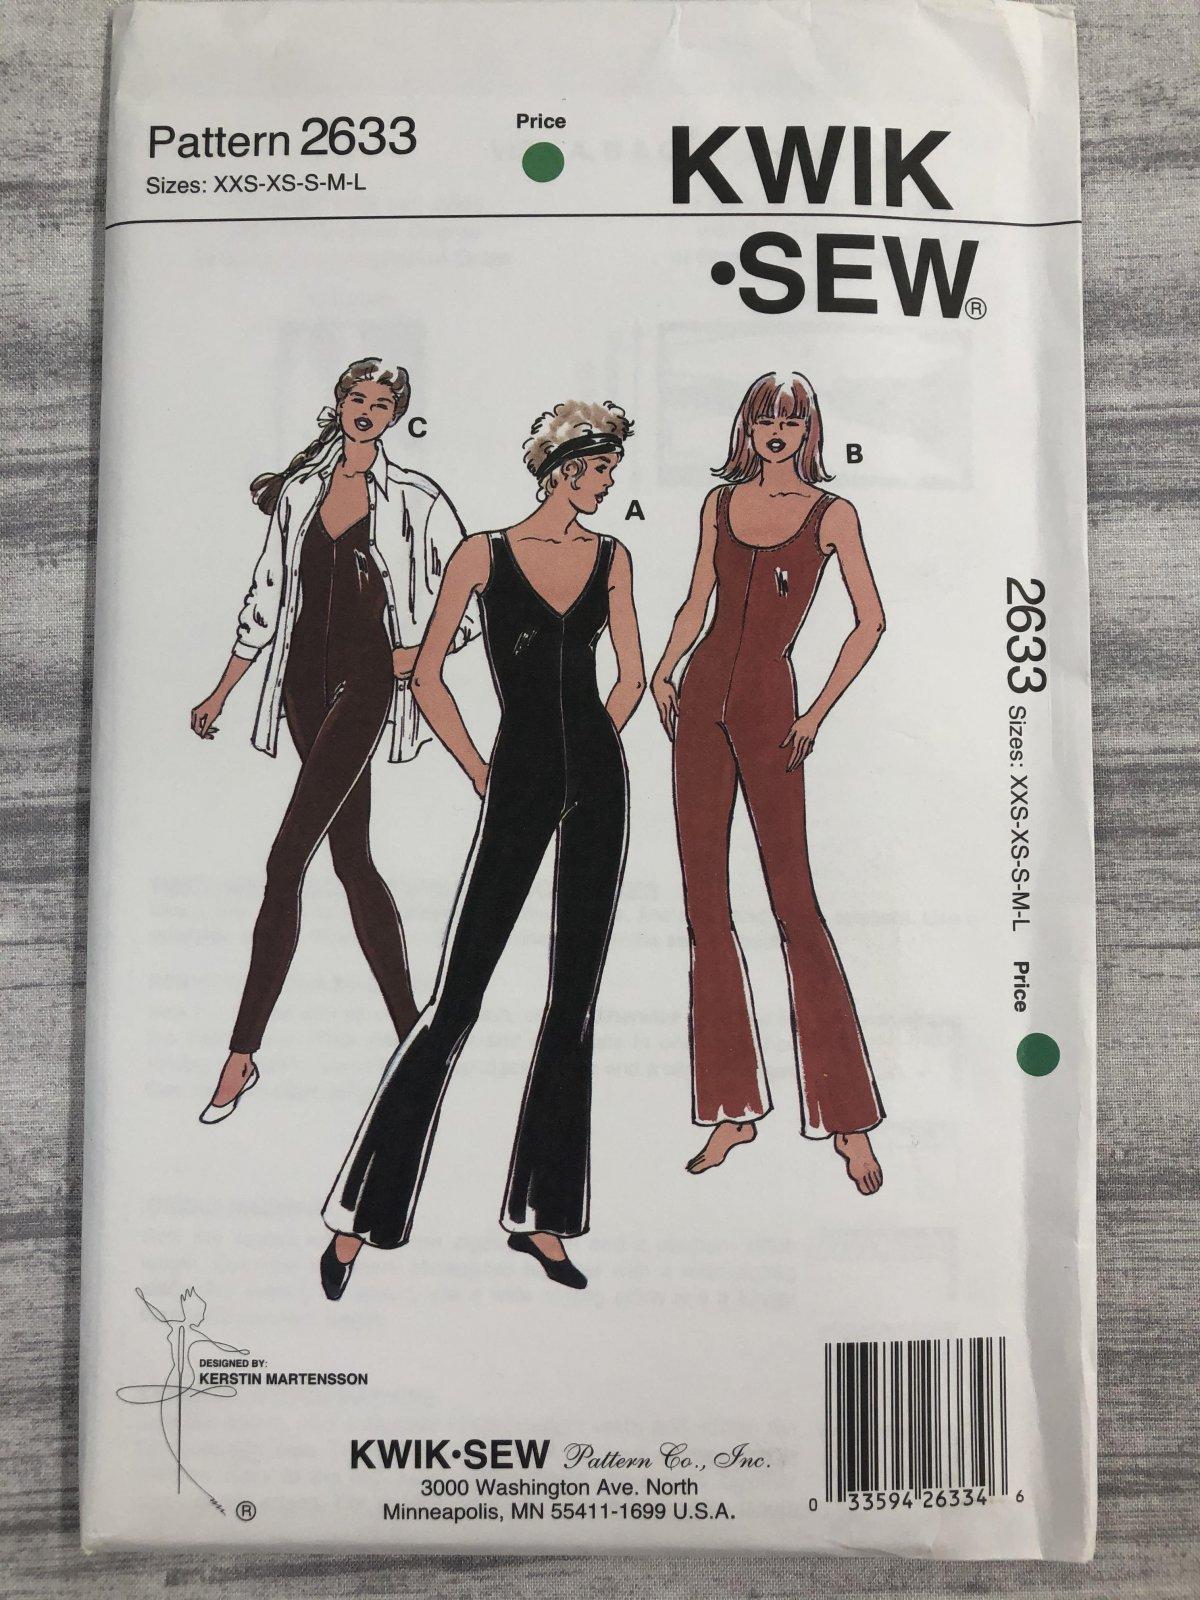 Kwik Sew 2633 Sizes XXS-L